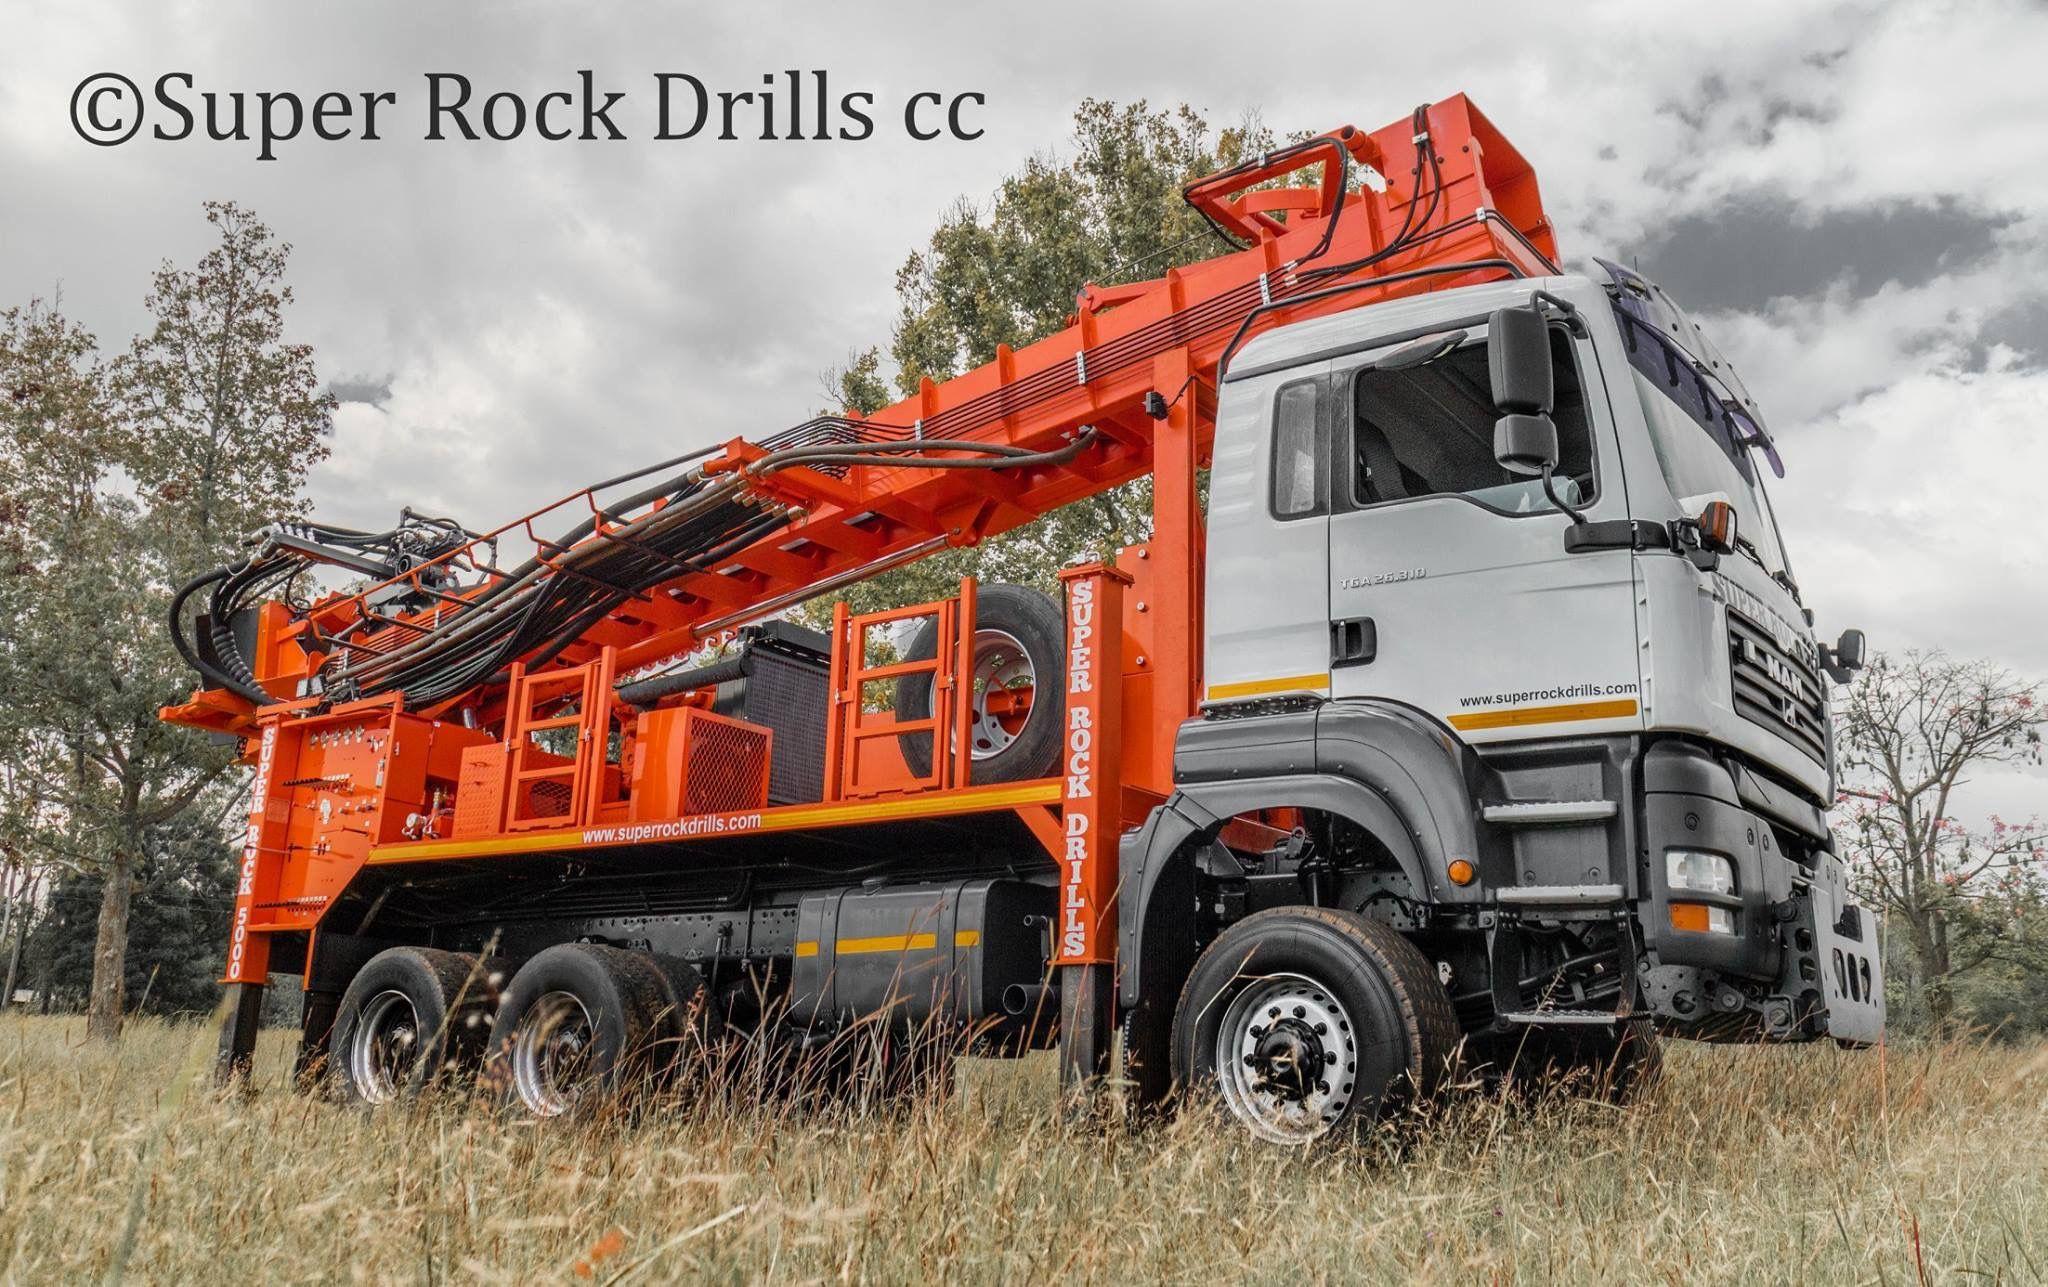 A super rock 5000 rc rig manufactured by super rock drills